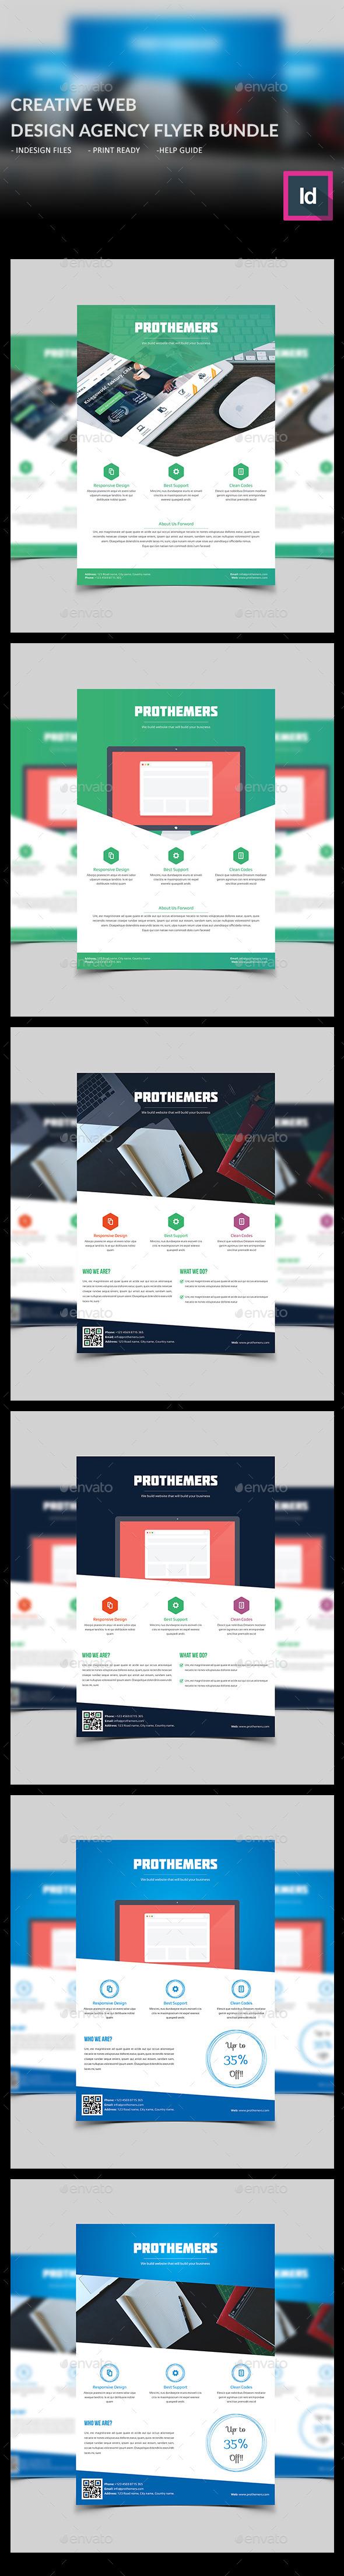 Creative Web Design Agency Flyer Bundle